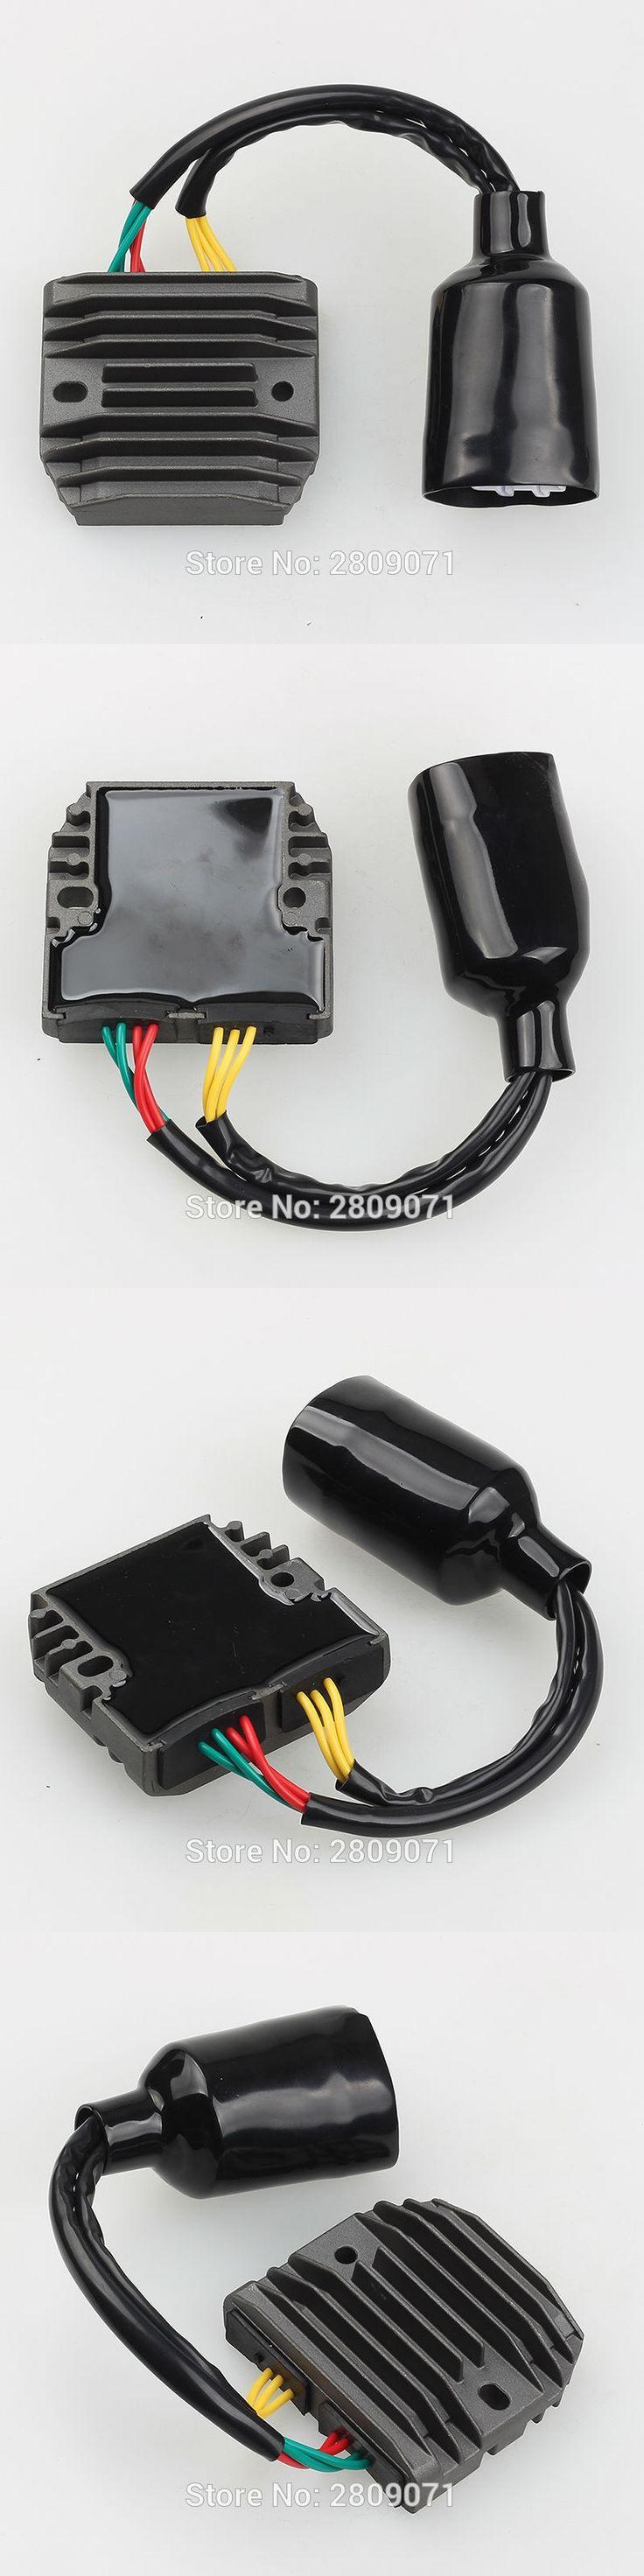 Best 25+ Voltage regulator ideas on Pinterest | Basics of ...